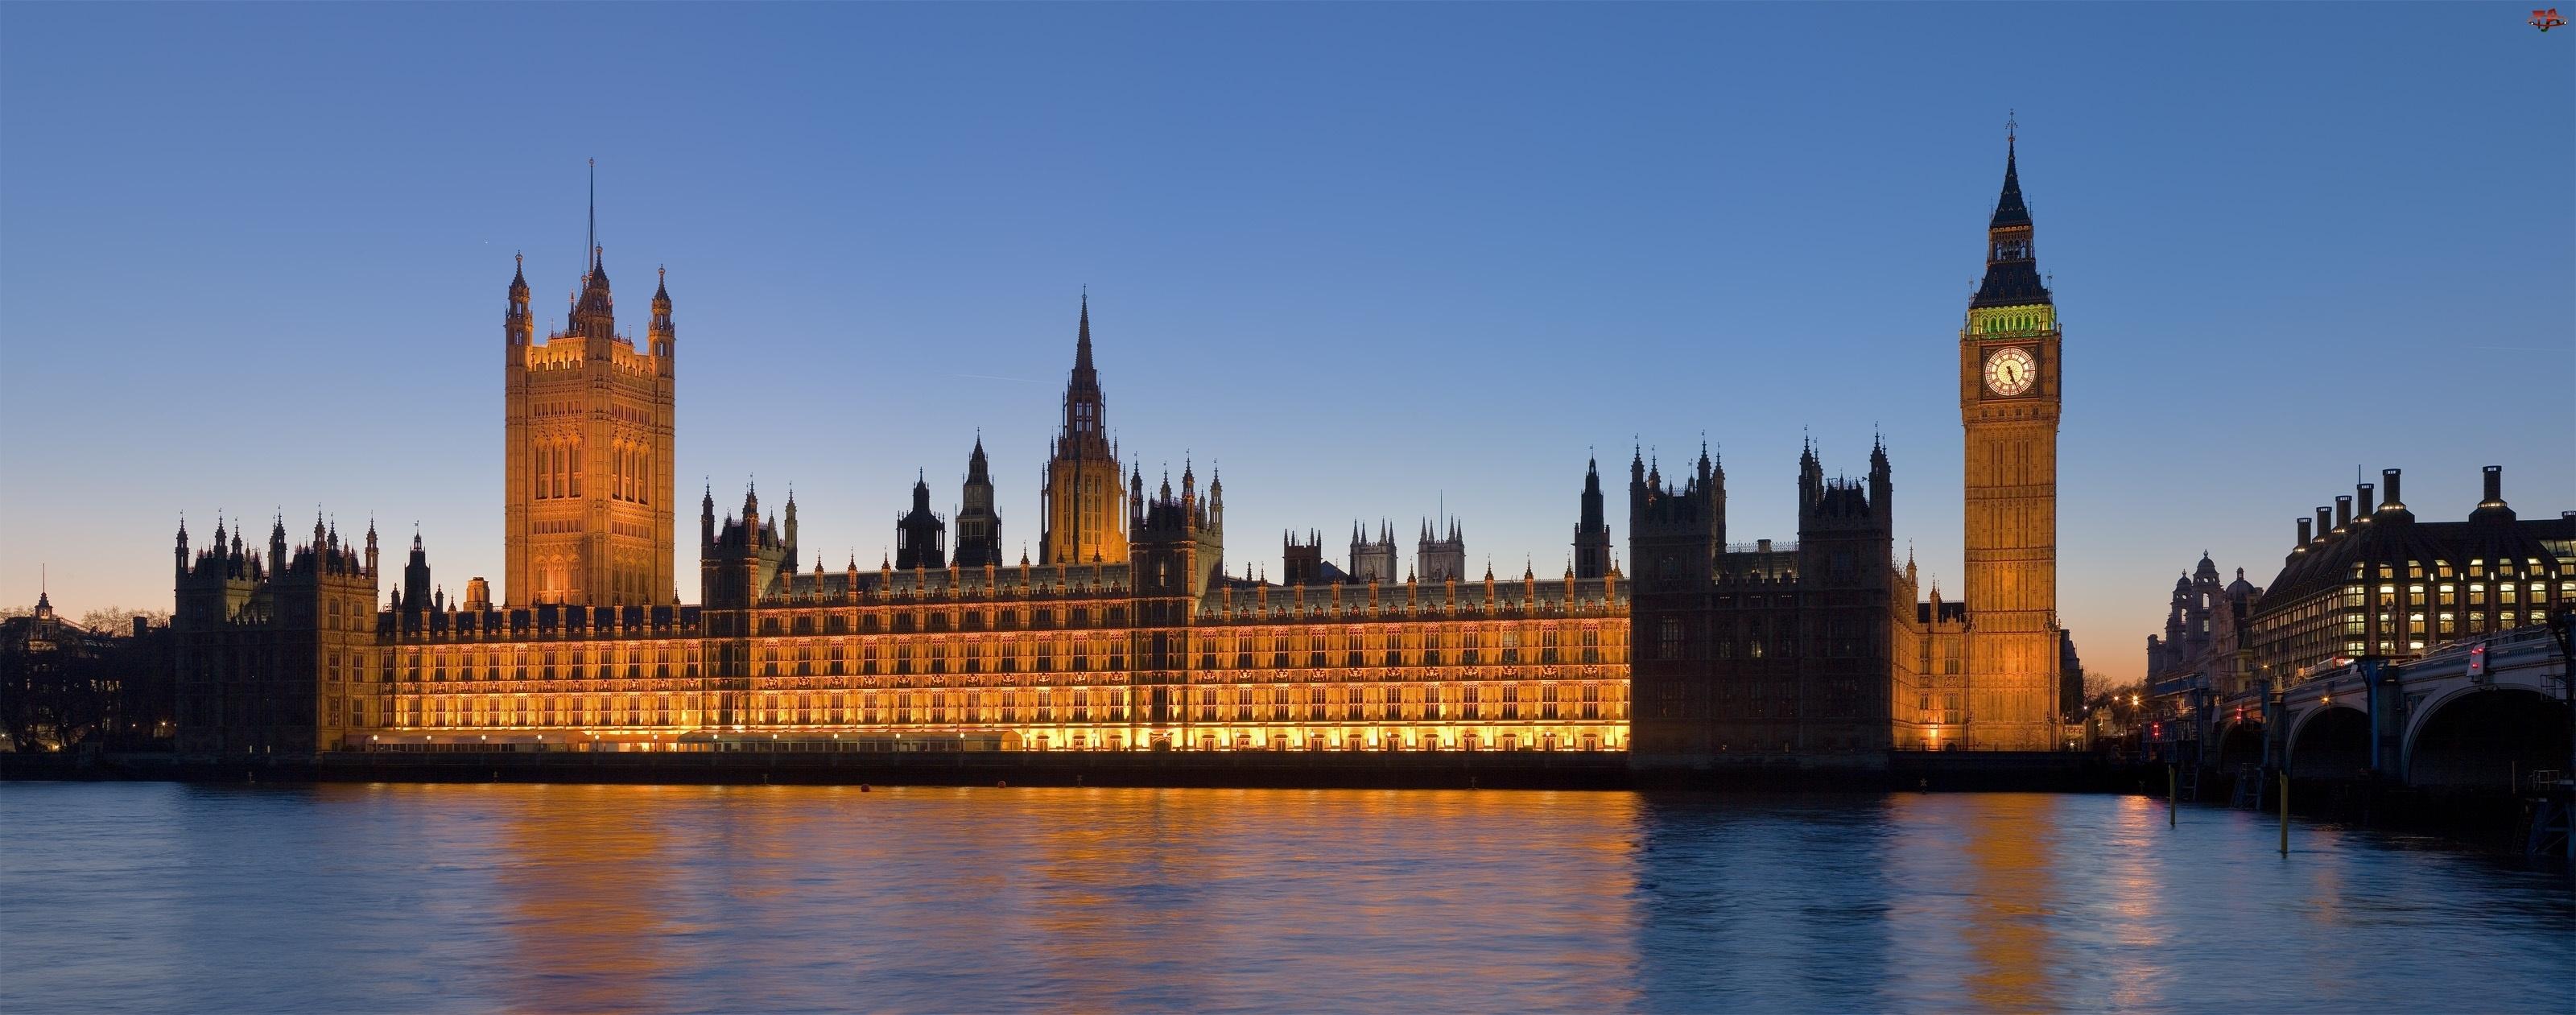 Londyn, Pałac, Big Ben, Westminster, Tamiza